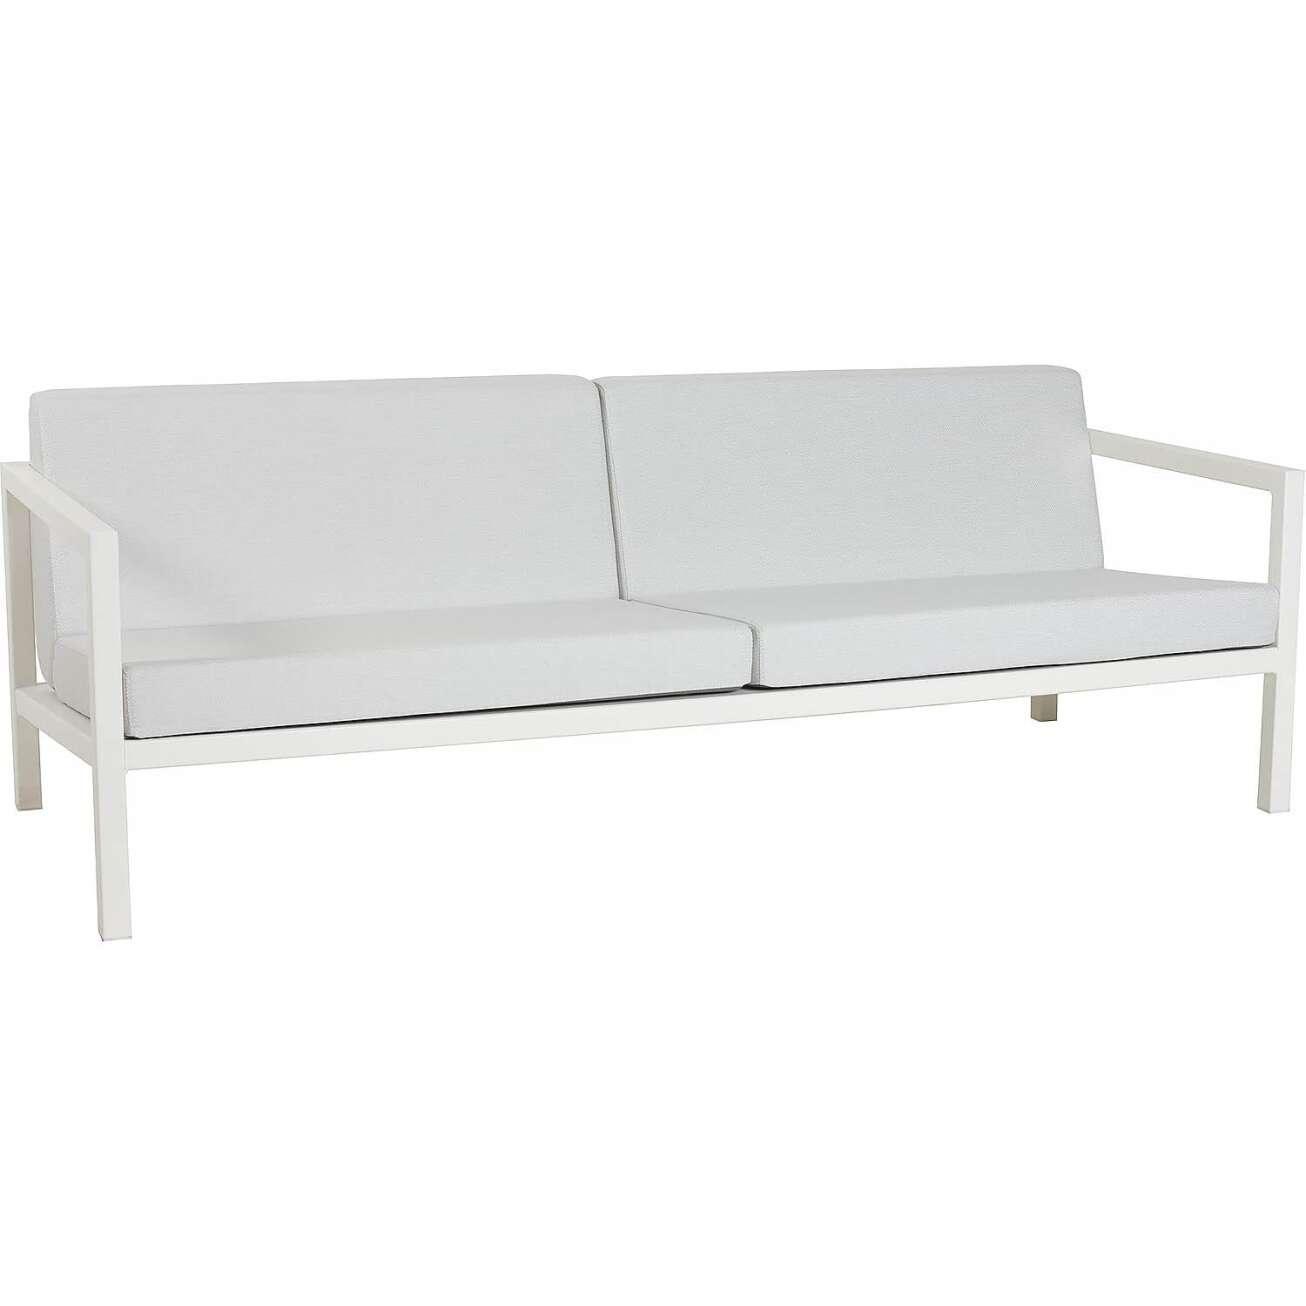 Sundays Frame 3-seter sofa i hvit aluminium med hvite puter